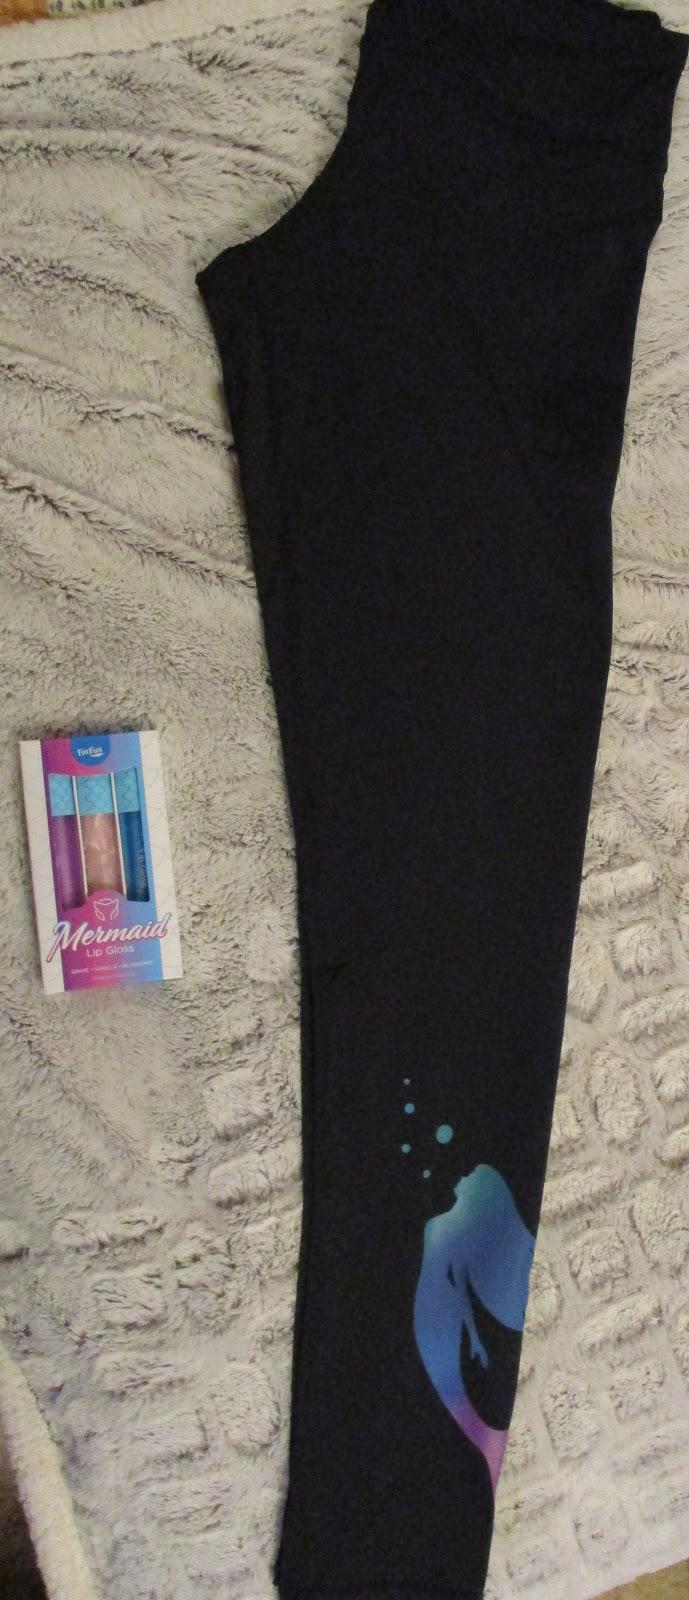 49fae5a8354 Fin Fun Black Mermaid Print Leggings   Mermaid Lip Gloss Set Holiday Gift  Guide 2018